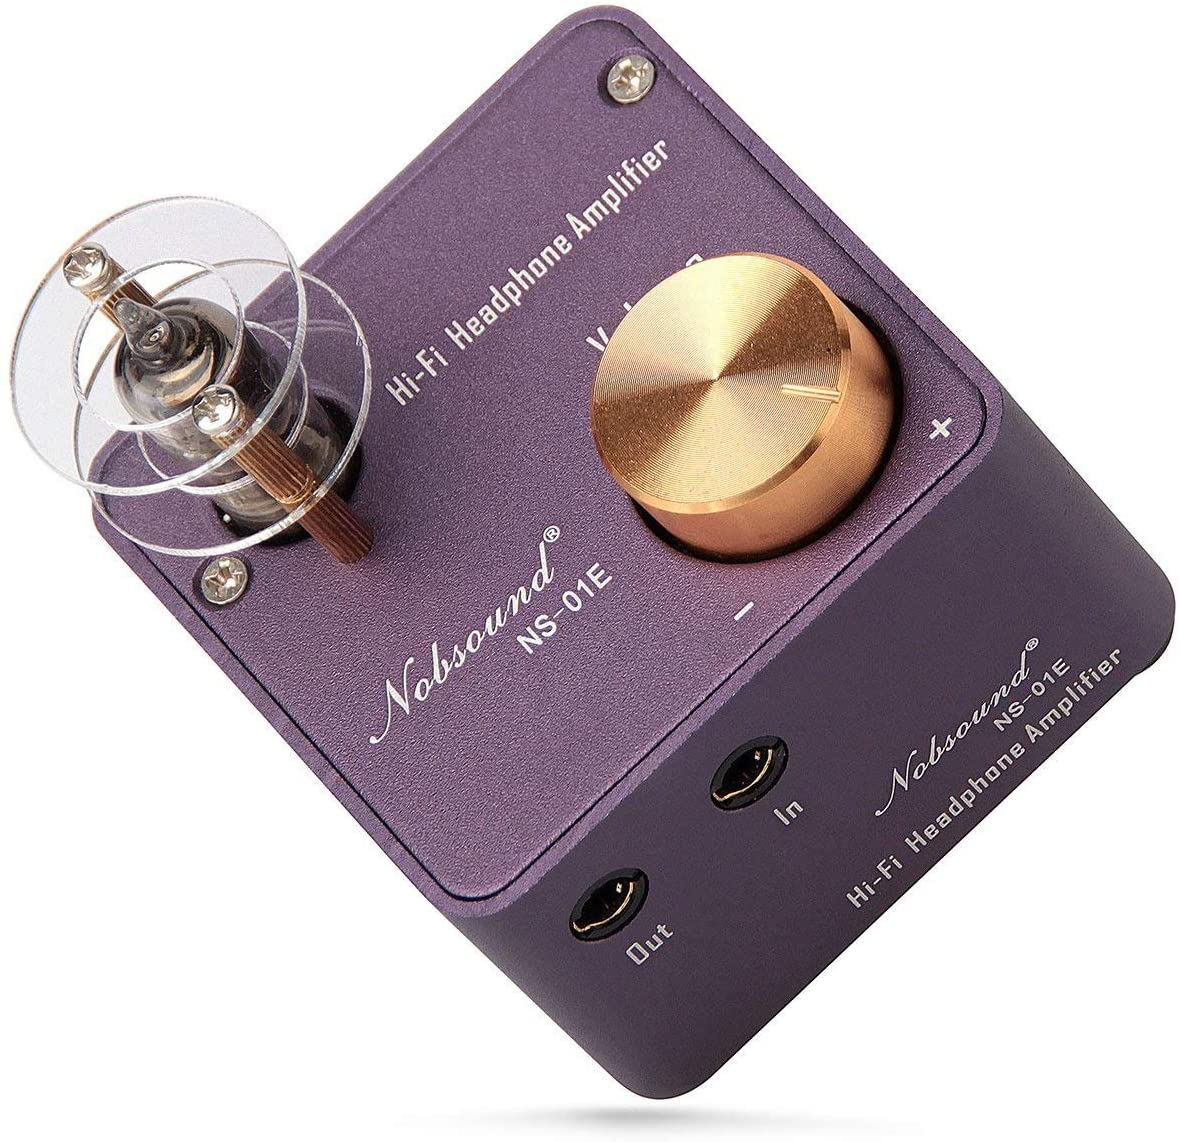 NOBSOUND NS-01E 미니 튜브 헤드폰 앰프 스테레오 HIFI 앰프 오디오 프리 앰프(자주색)